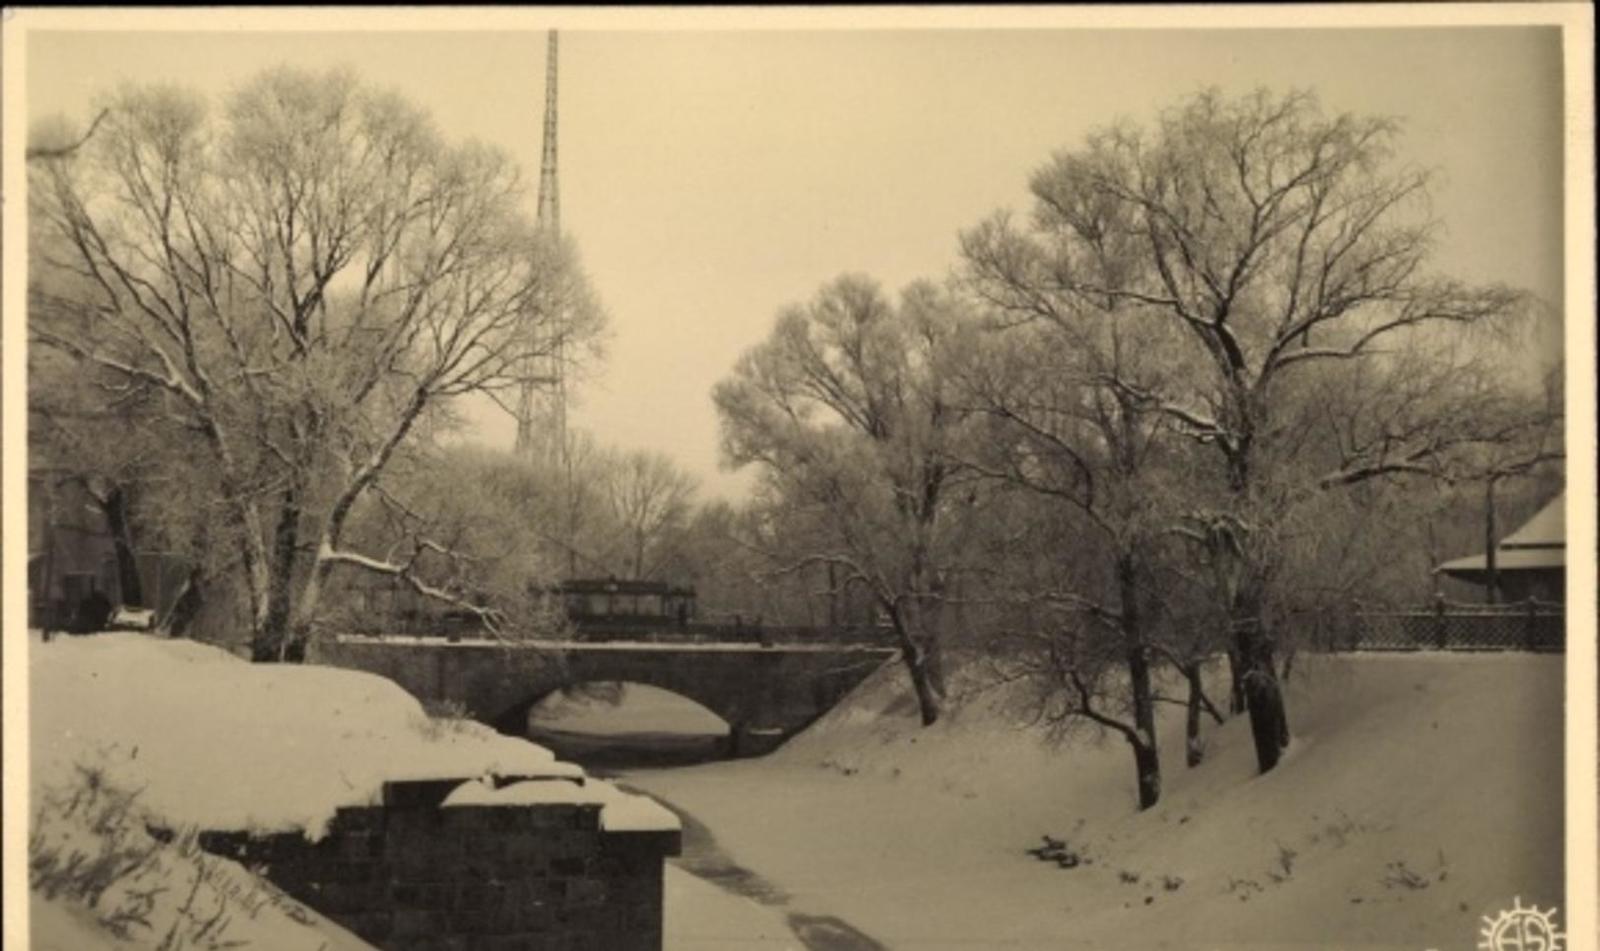 Riga -  Cp Riga Lettland, Ziema, Winterpartie, Straßenbahn Linie 3